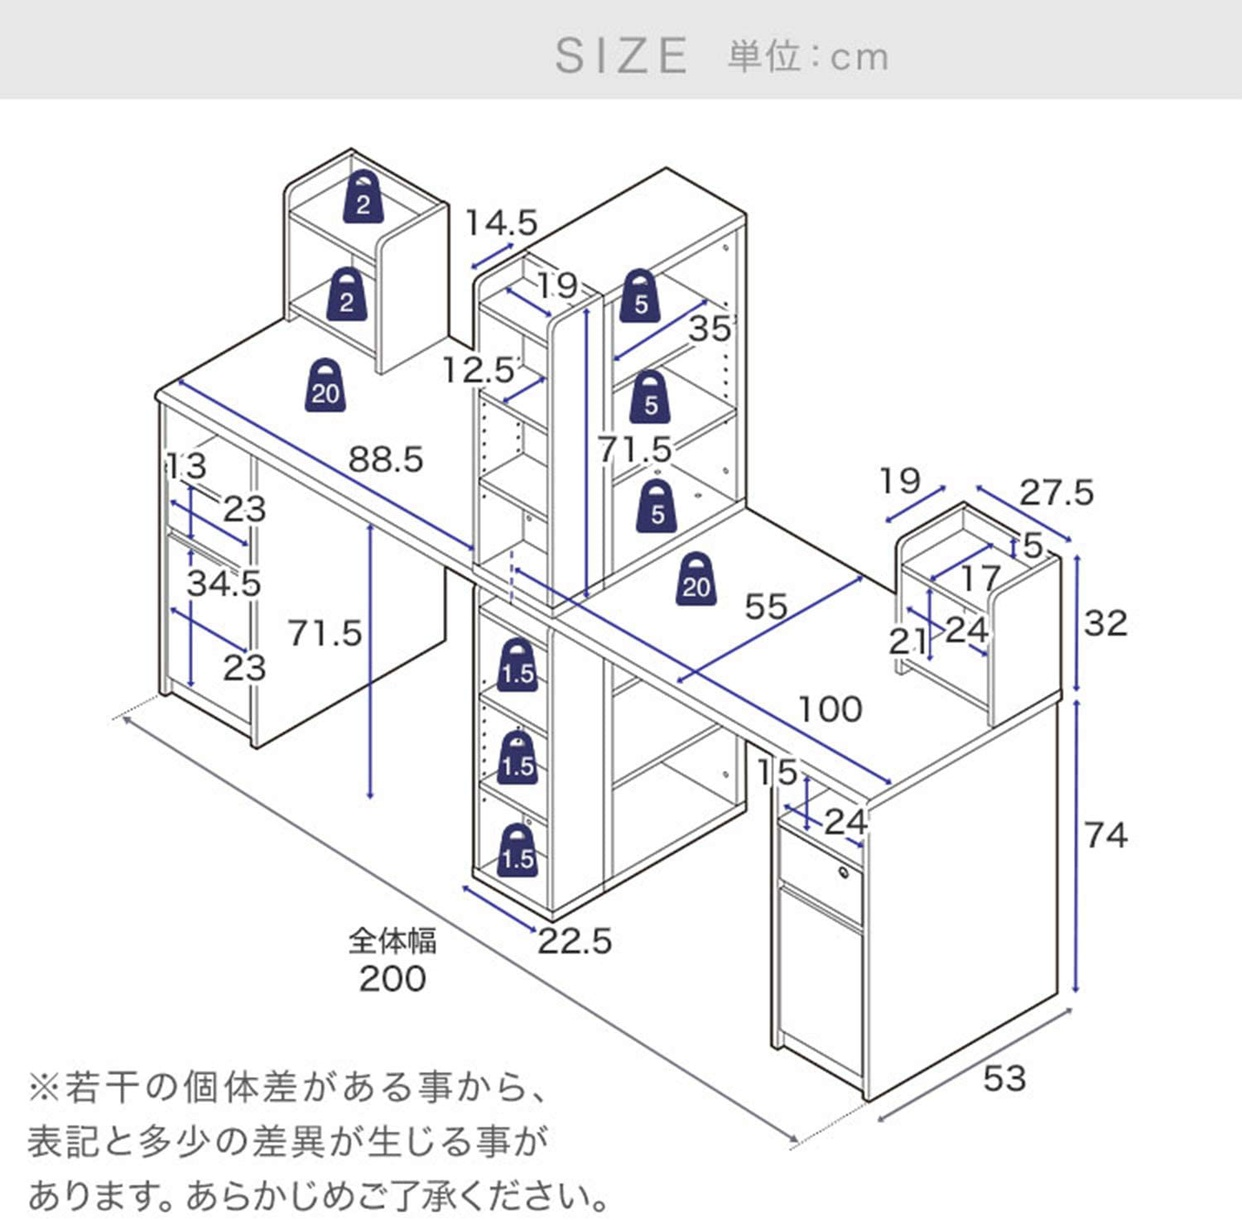 LOWYA(ロウヤ) 学習机 2人用ツインデスク 本棚・サイドラック付きの商品画像7